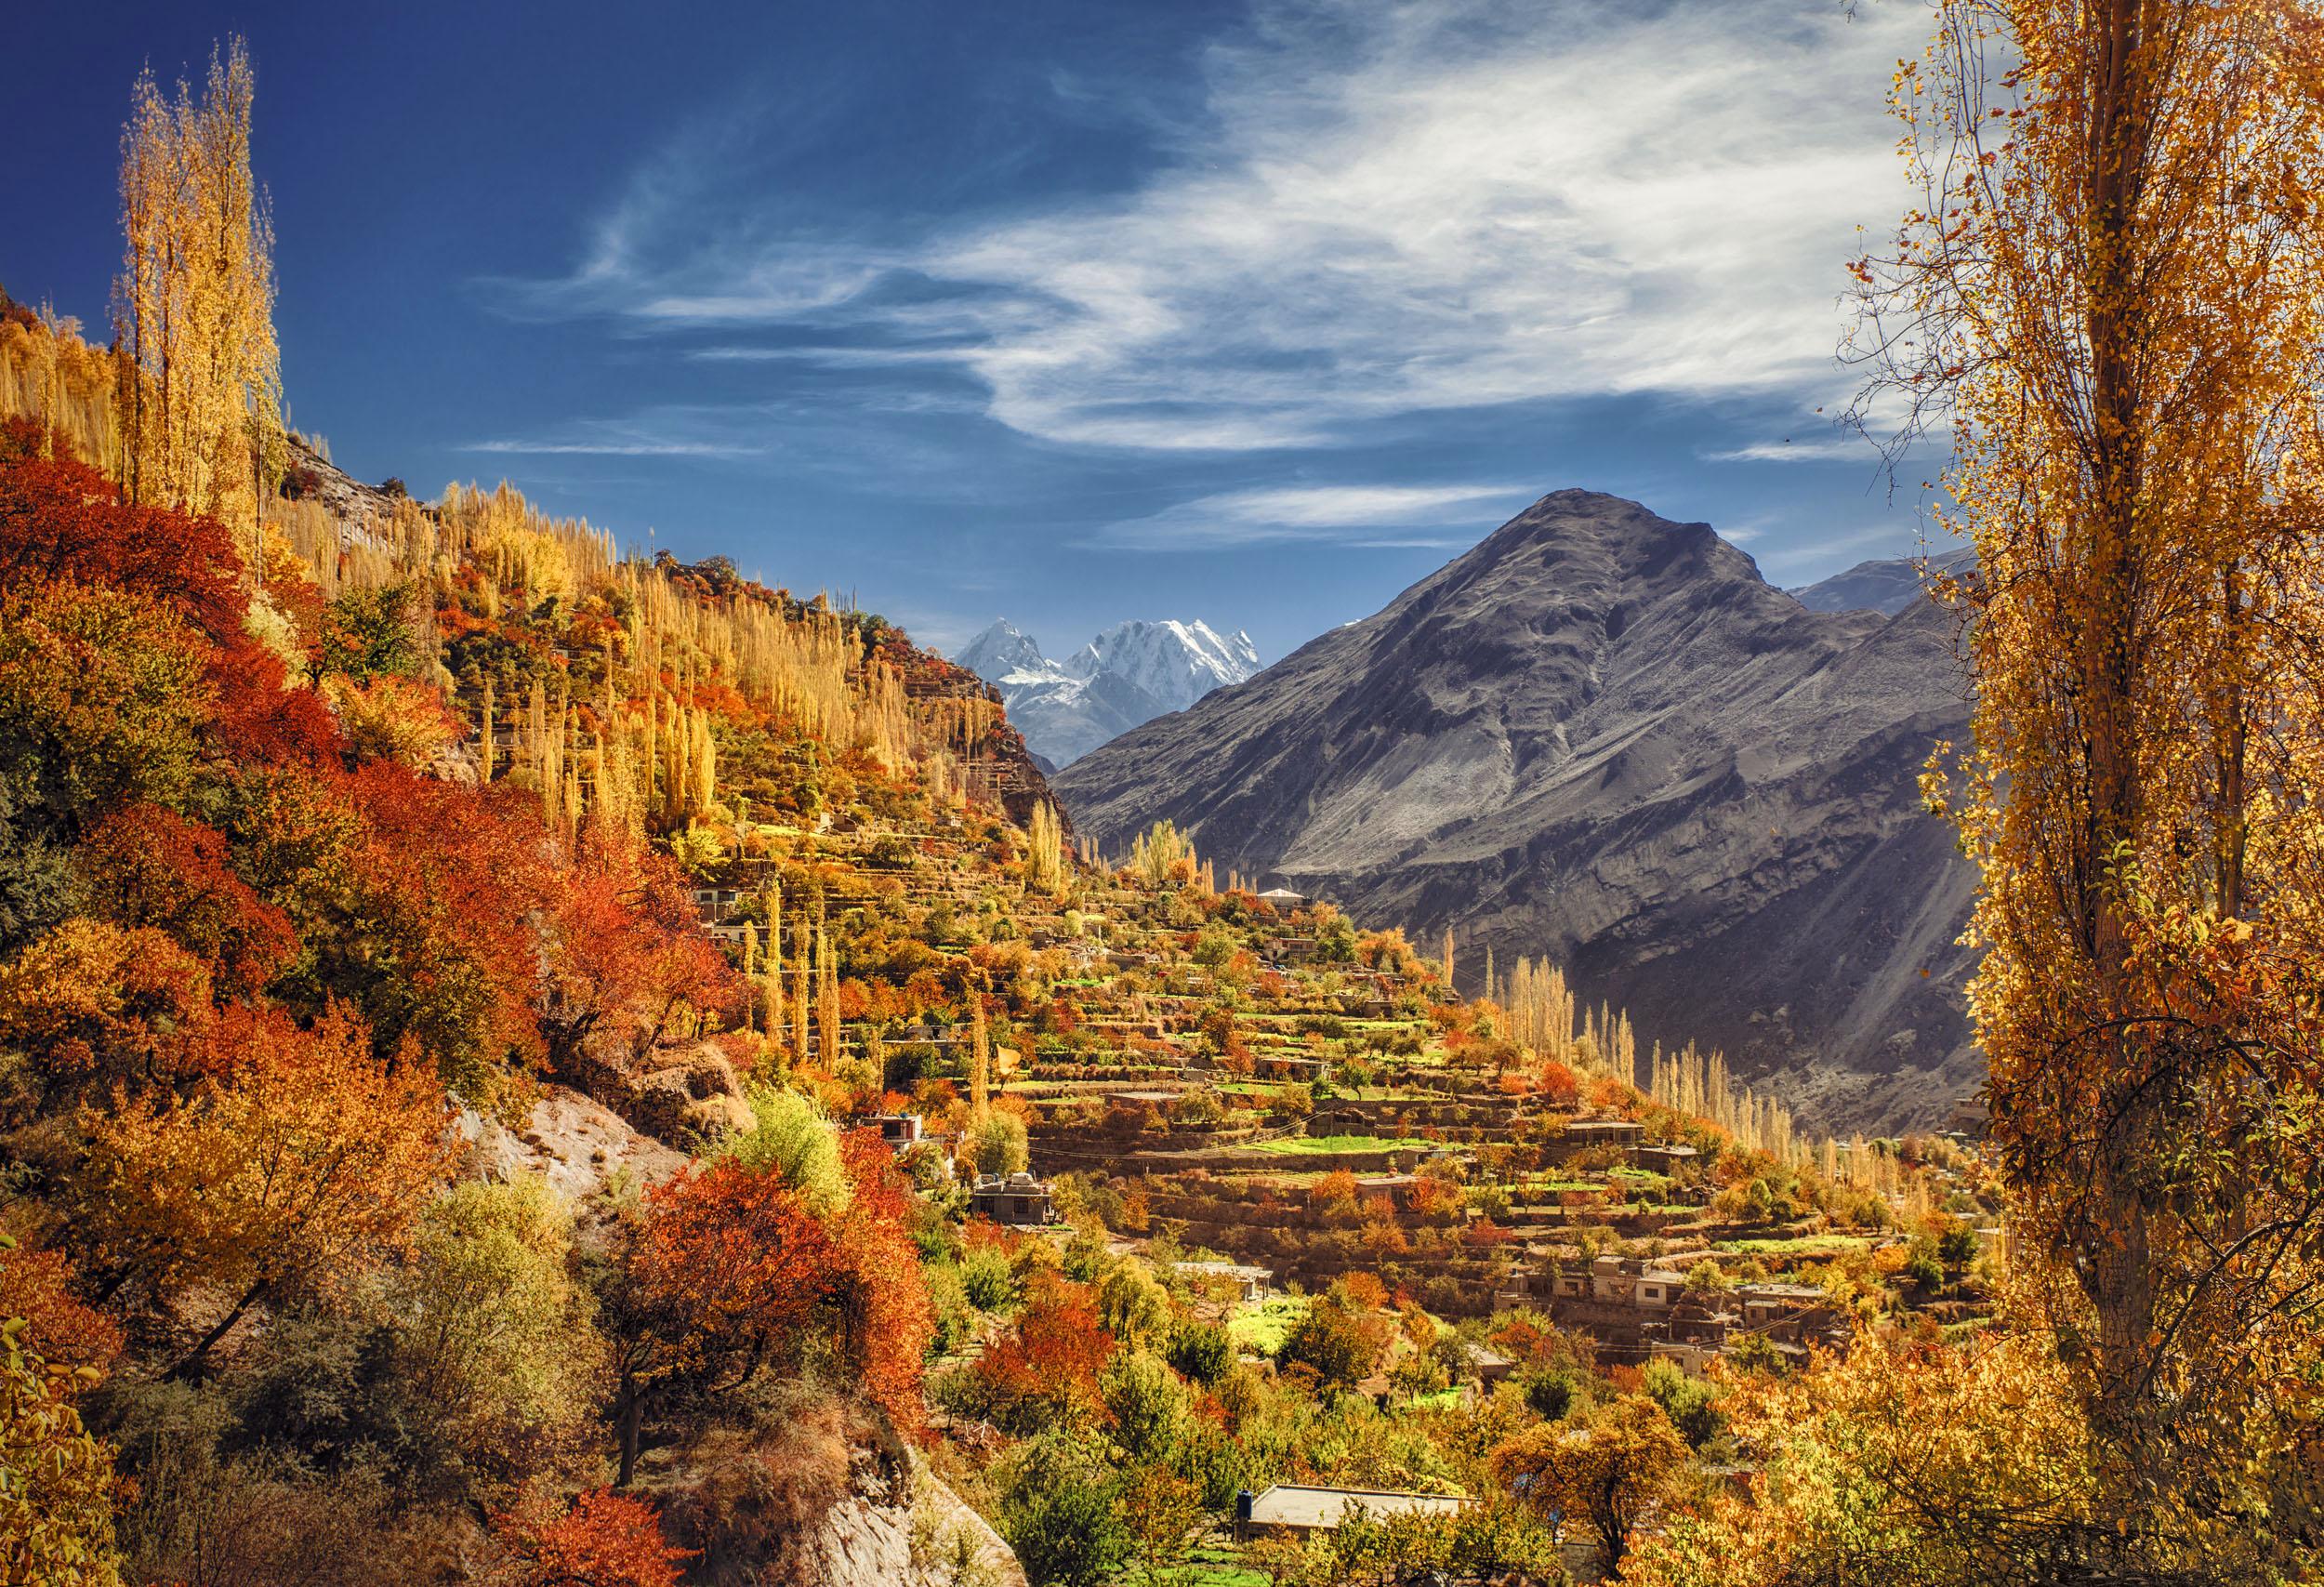 Fichier:Hunza - Altit Valley - Nasr Rahman.jpg — Wikipédia